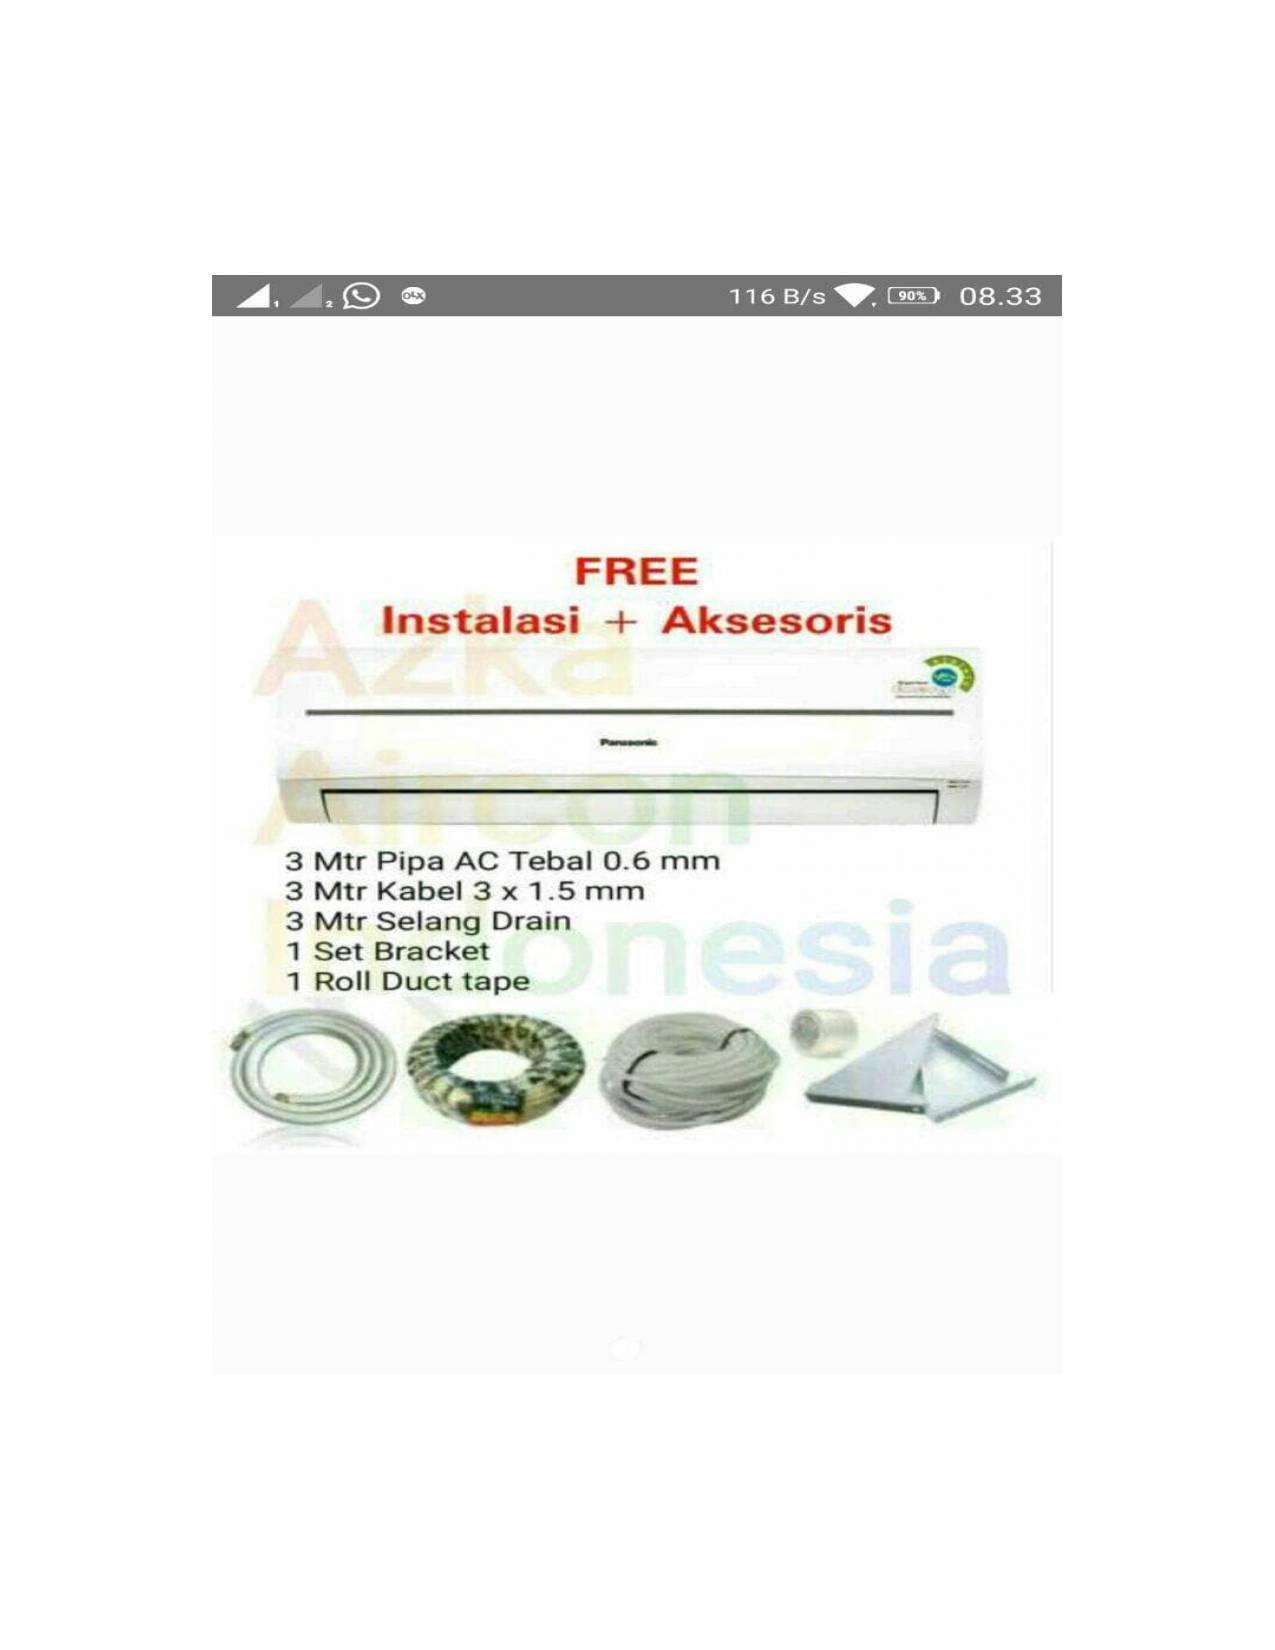 Buy Sell Cheapest Panasonic Ac 2 Best Quality Product Deals Split 1 Pk Yn 05 Skj Putih Free Ongkir Pemasangan Khusu Area Jabodetabek Cs Cu Pn 12